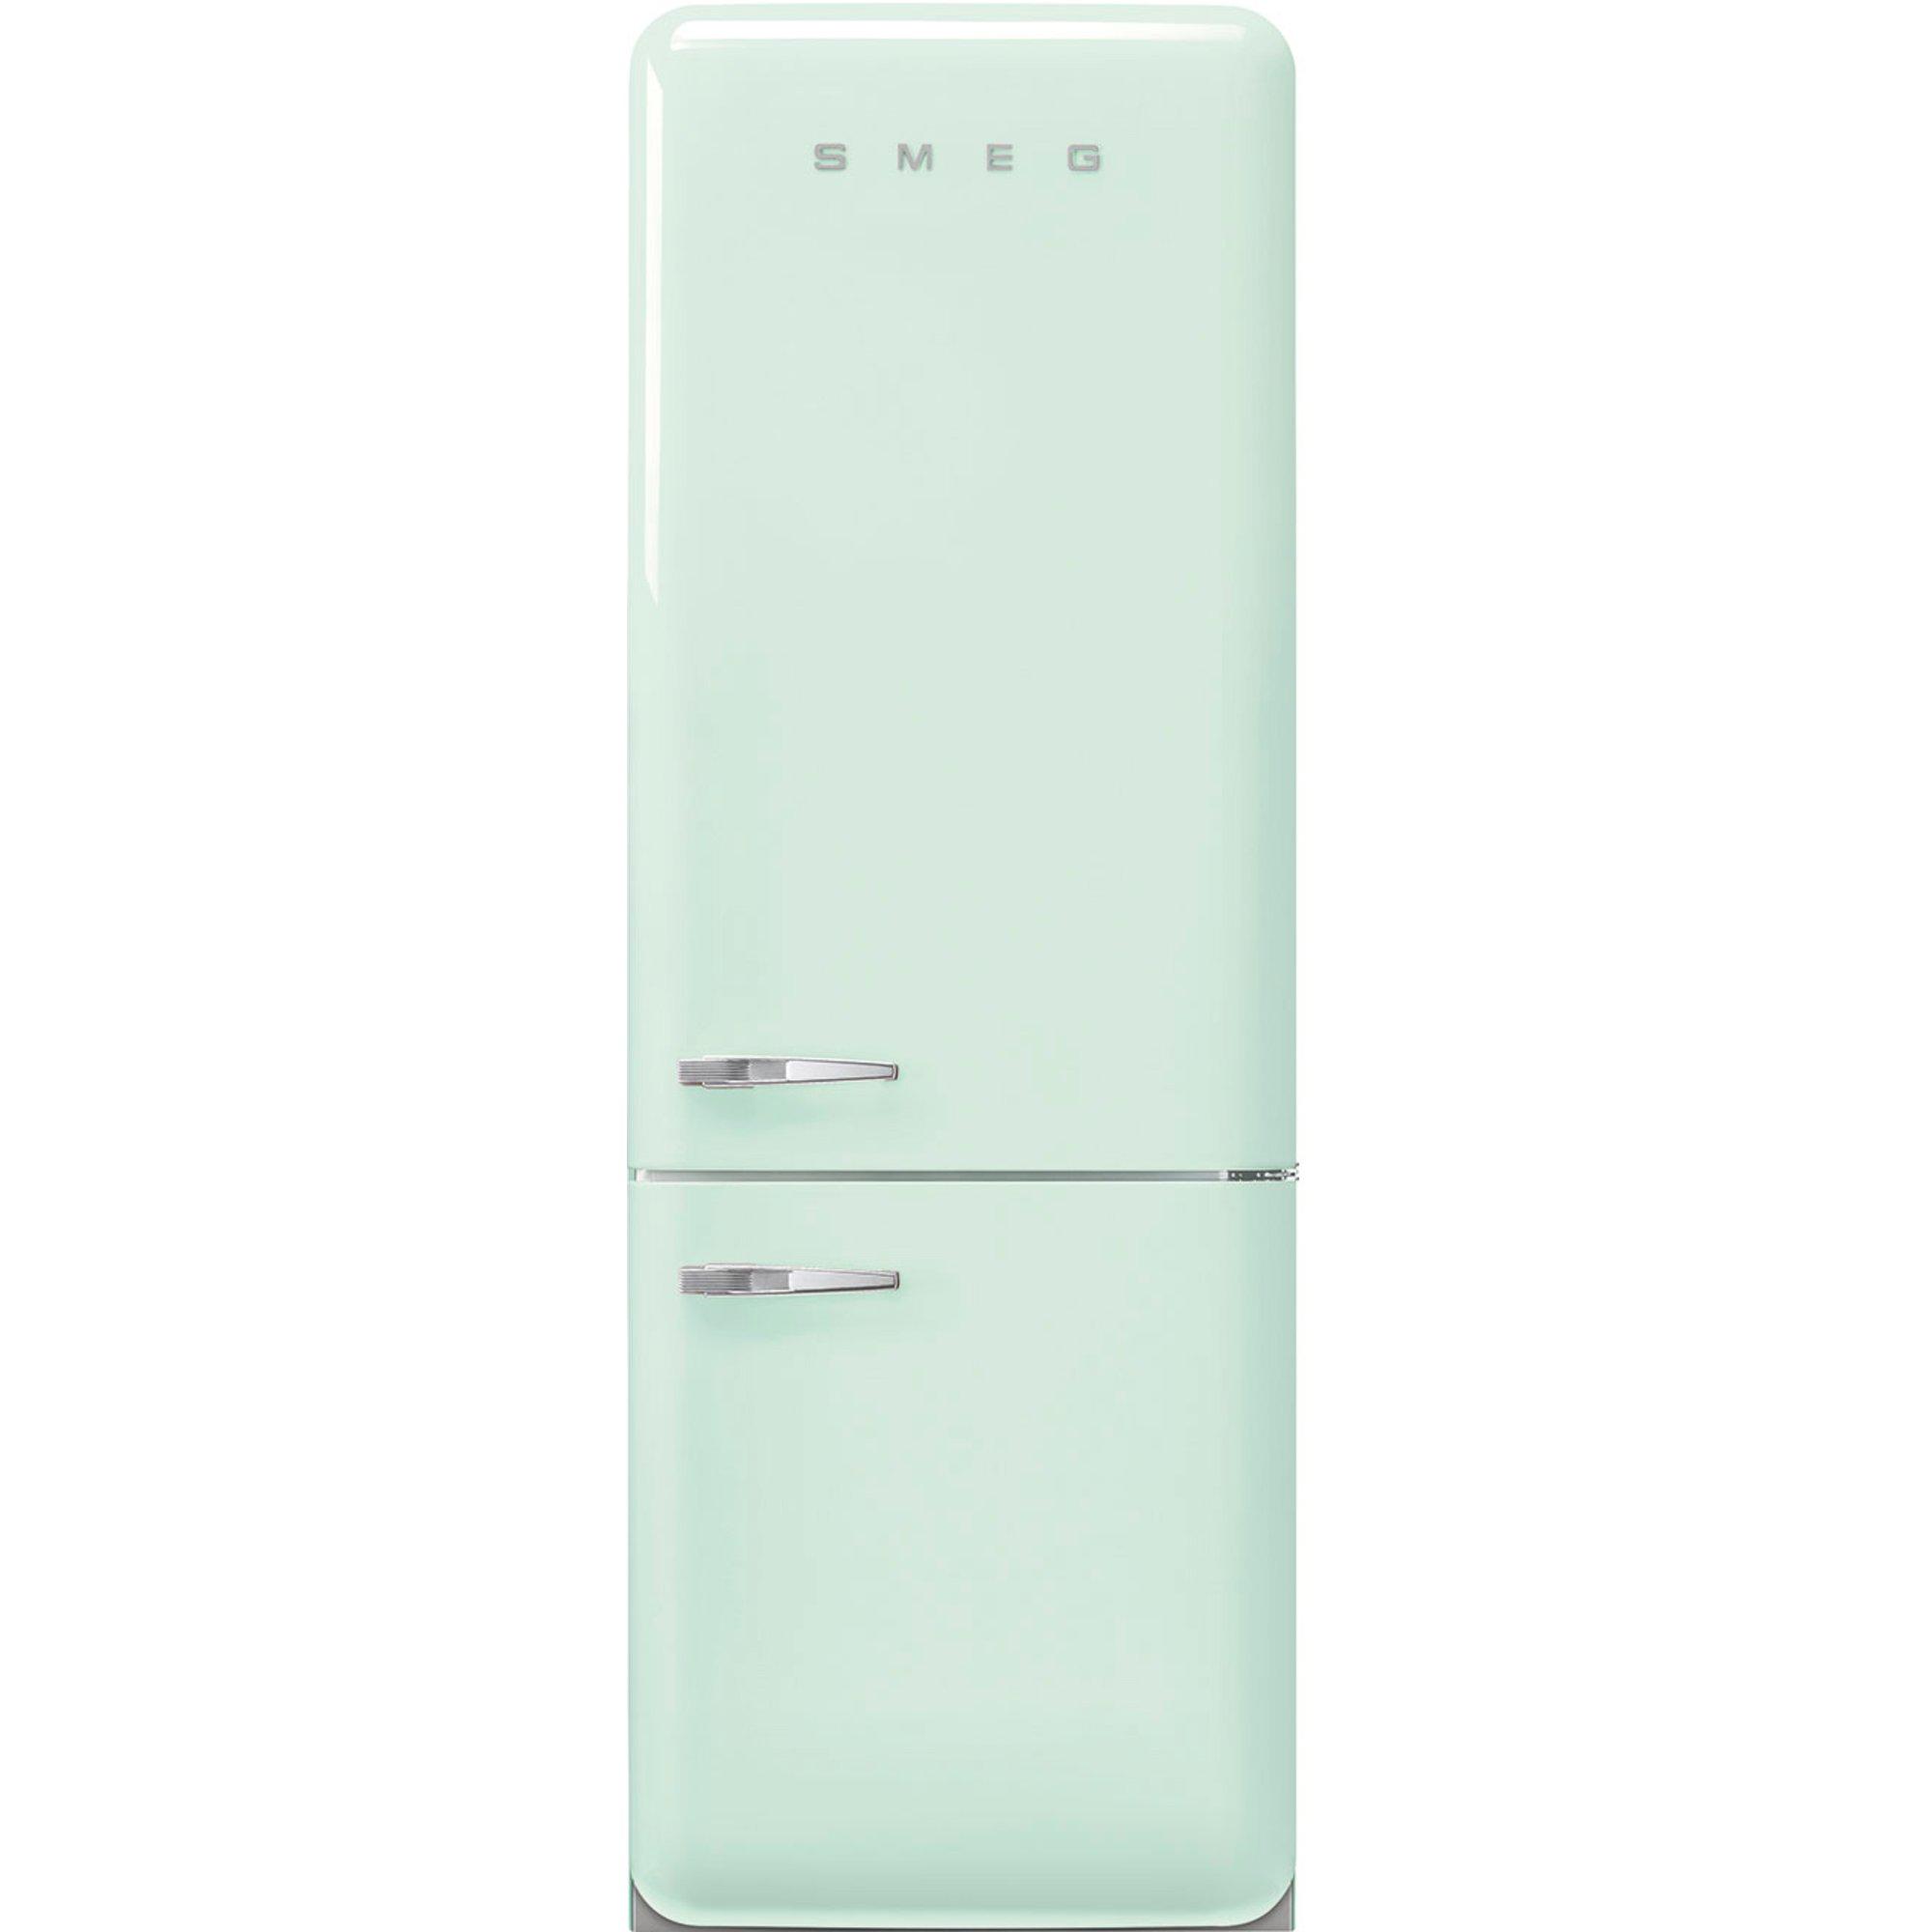 Smeg FAB38RPG5 køle-/fryseskab, pastelgrøn